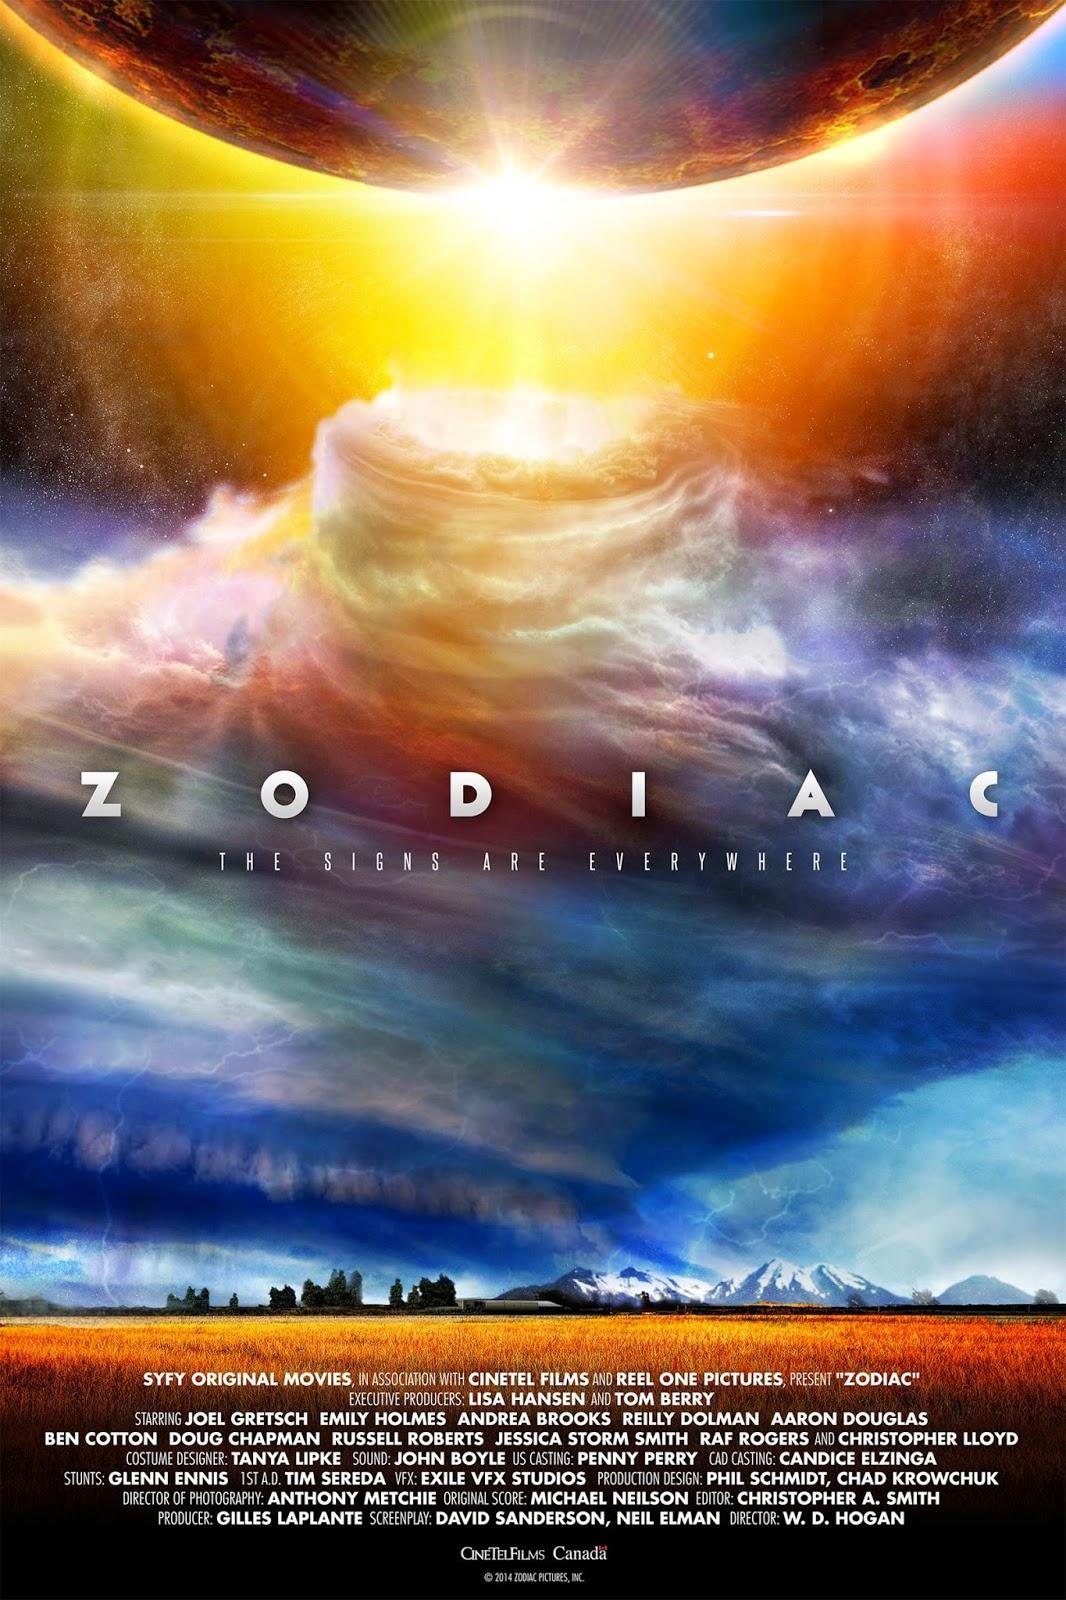 Zodiac: Signs of the Apocalypse 2014